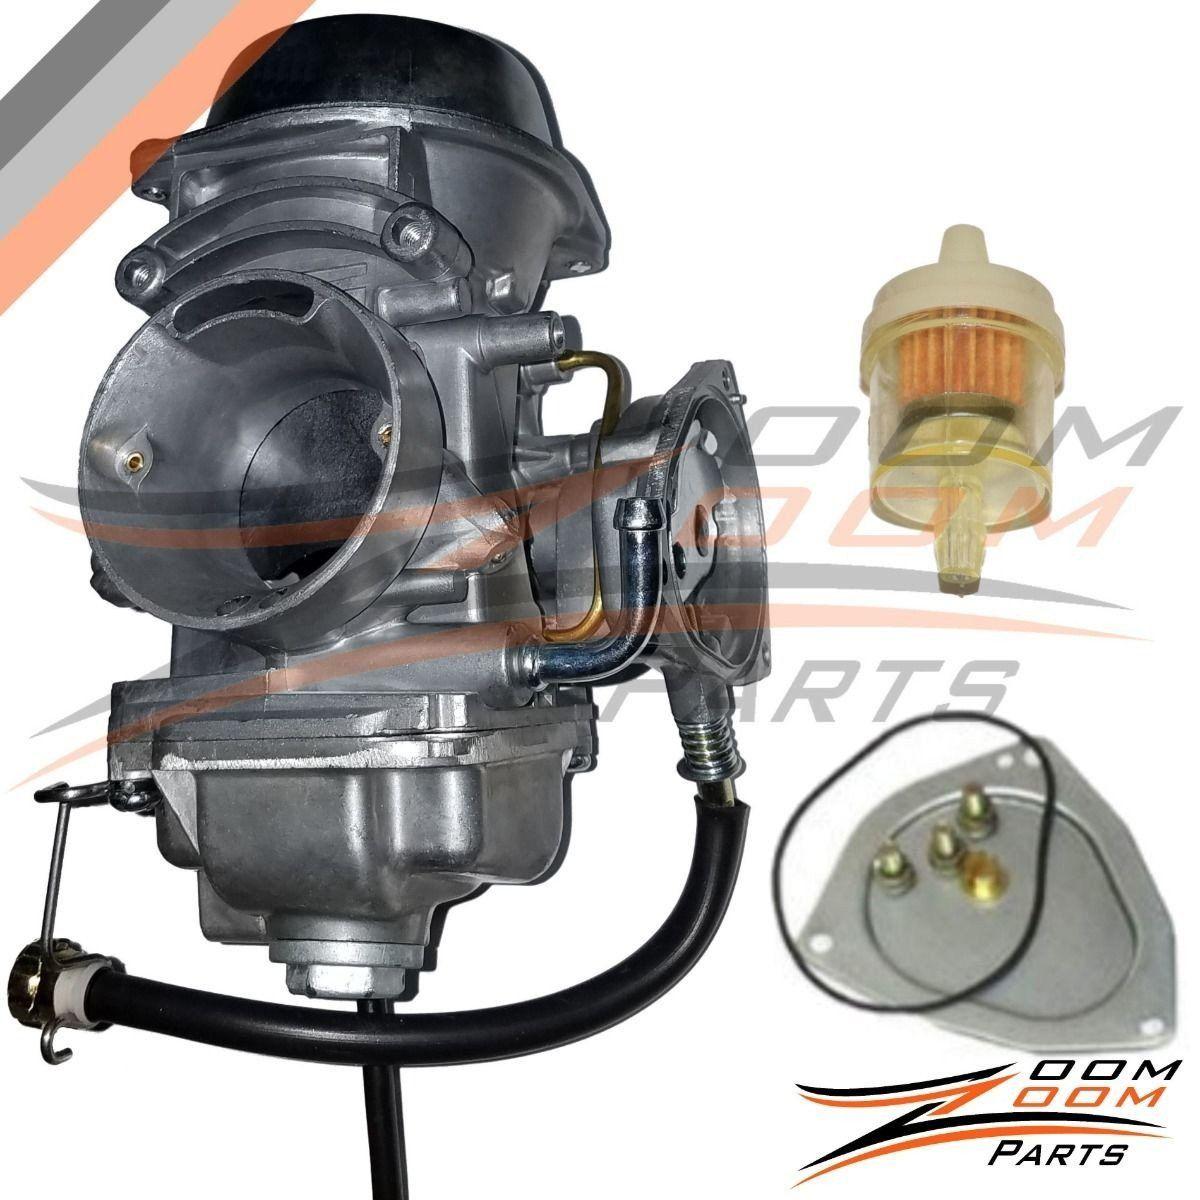 Carburetor Polaris Sportsman 500 4x4 Ho 2001 2005 2010 2011 2012 Carb Free Fedex 2 Day Shipping Zoom Zoom Parts Carburetor Sportsman 4x4